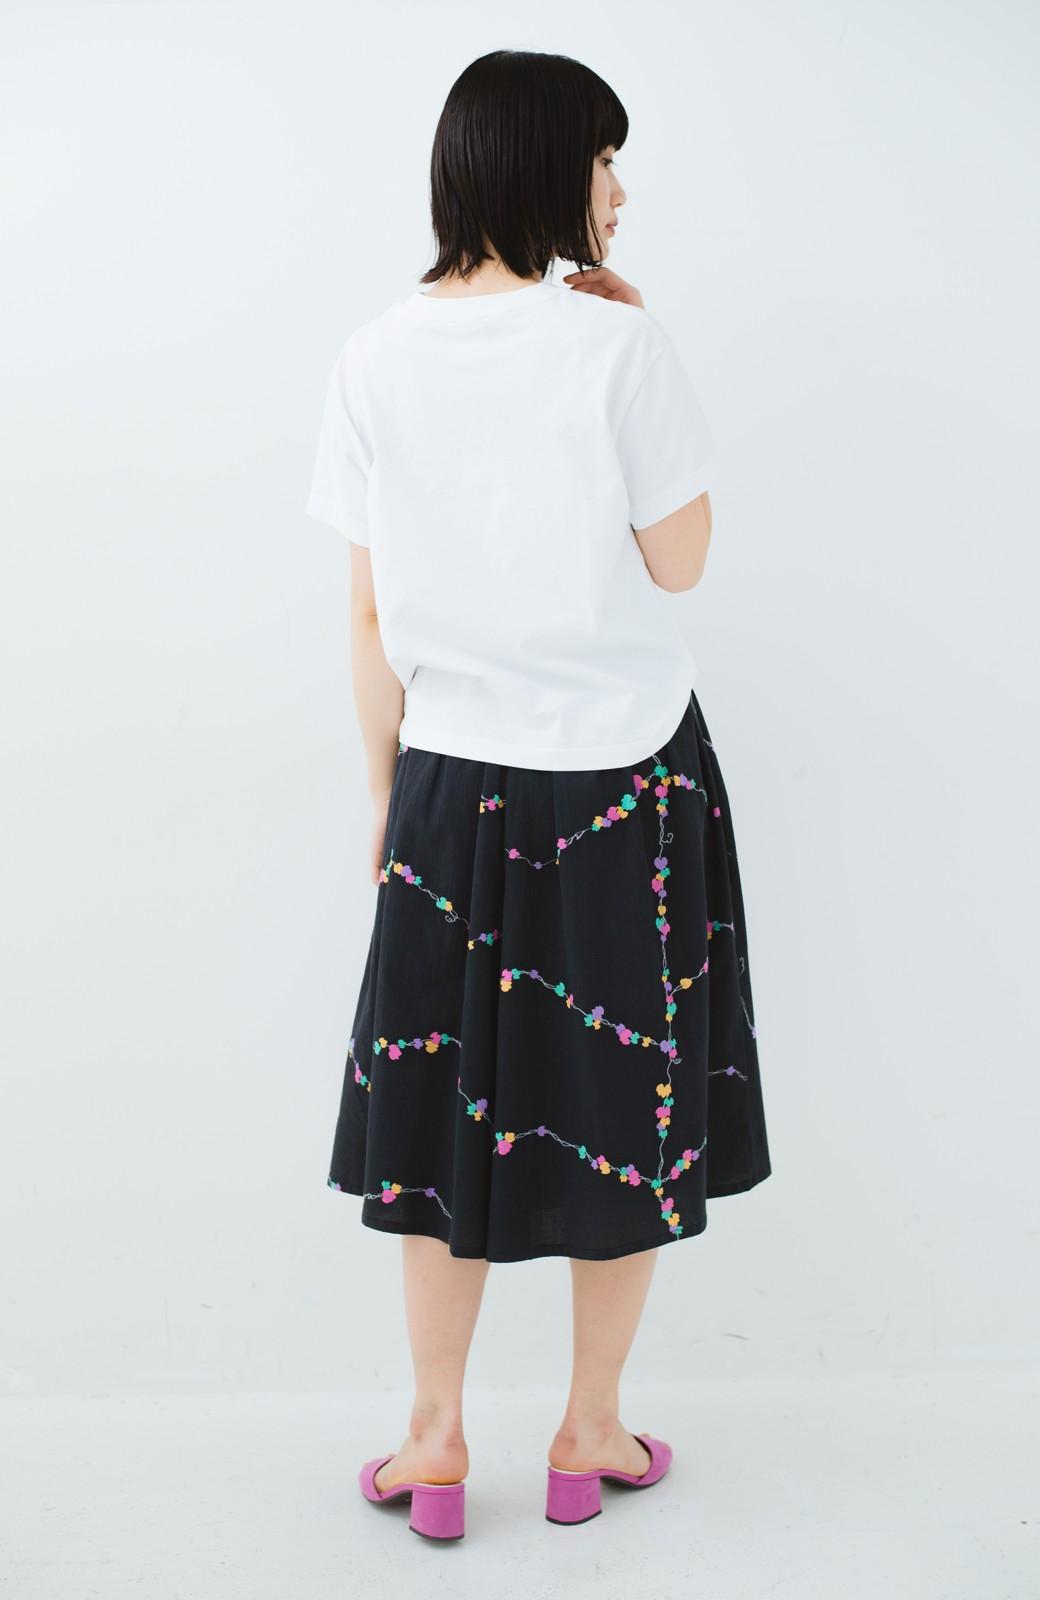 haco! 京都の浴衣屋さんと作った浴衣生地のスカート <ブラック系その他>の商品写真14